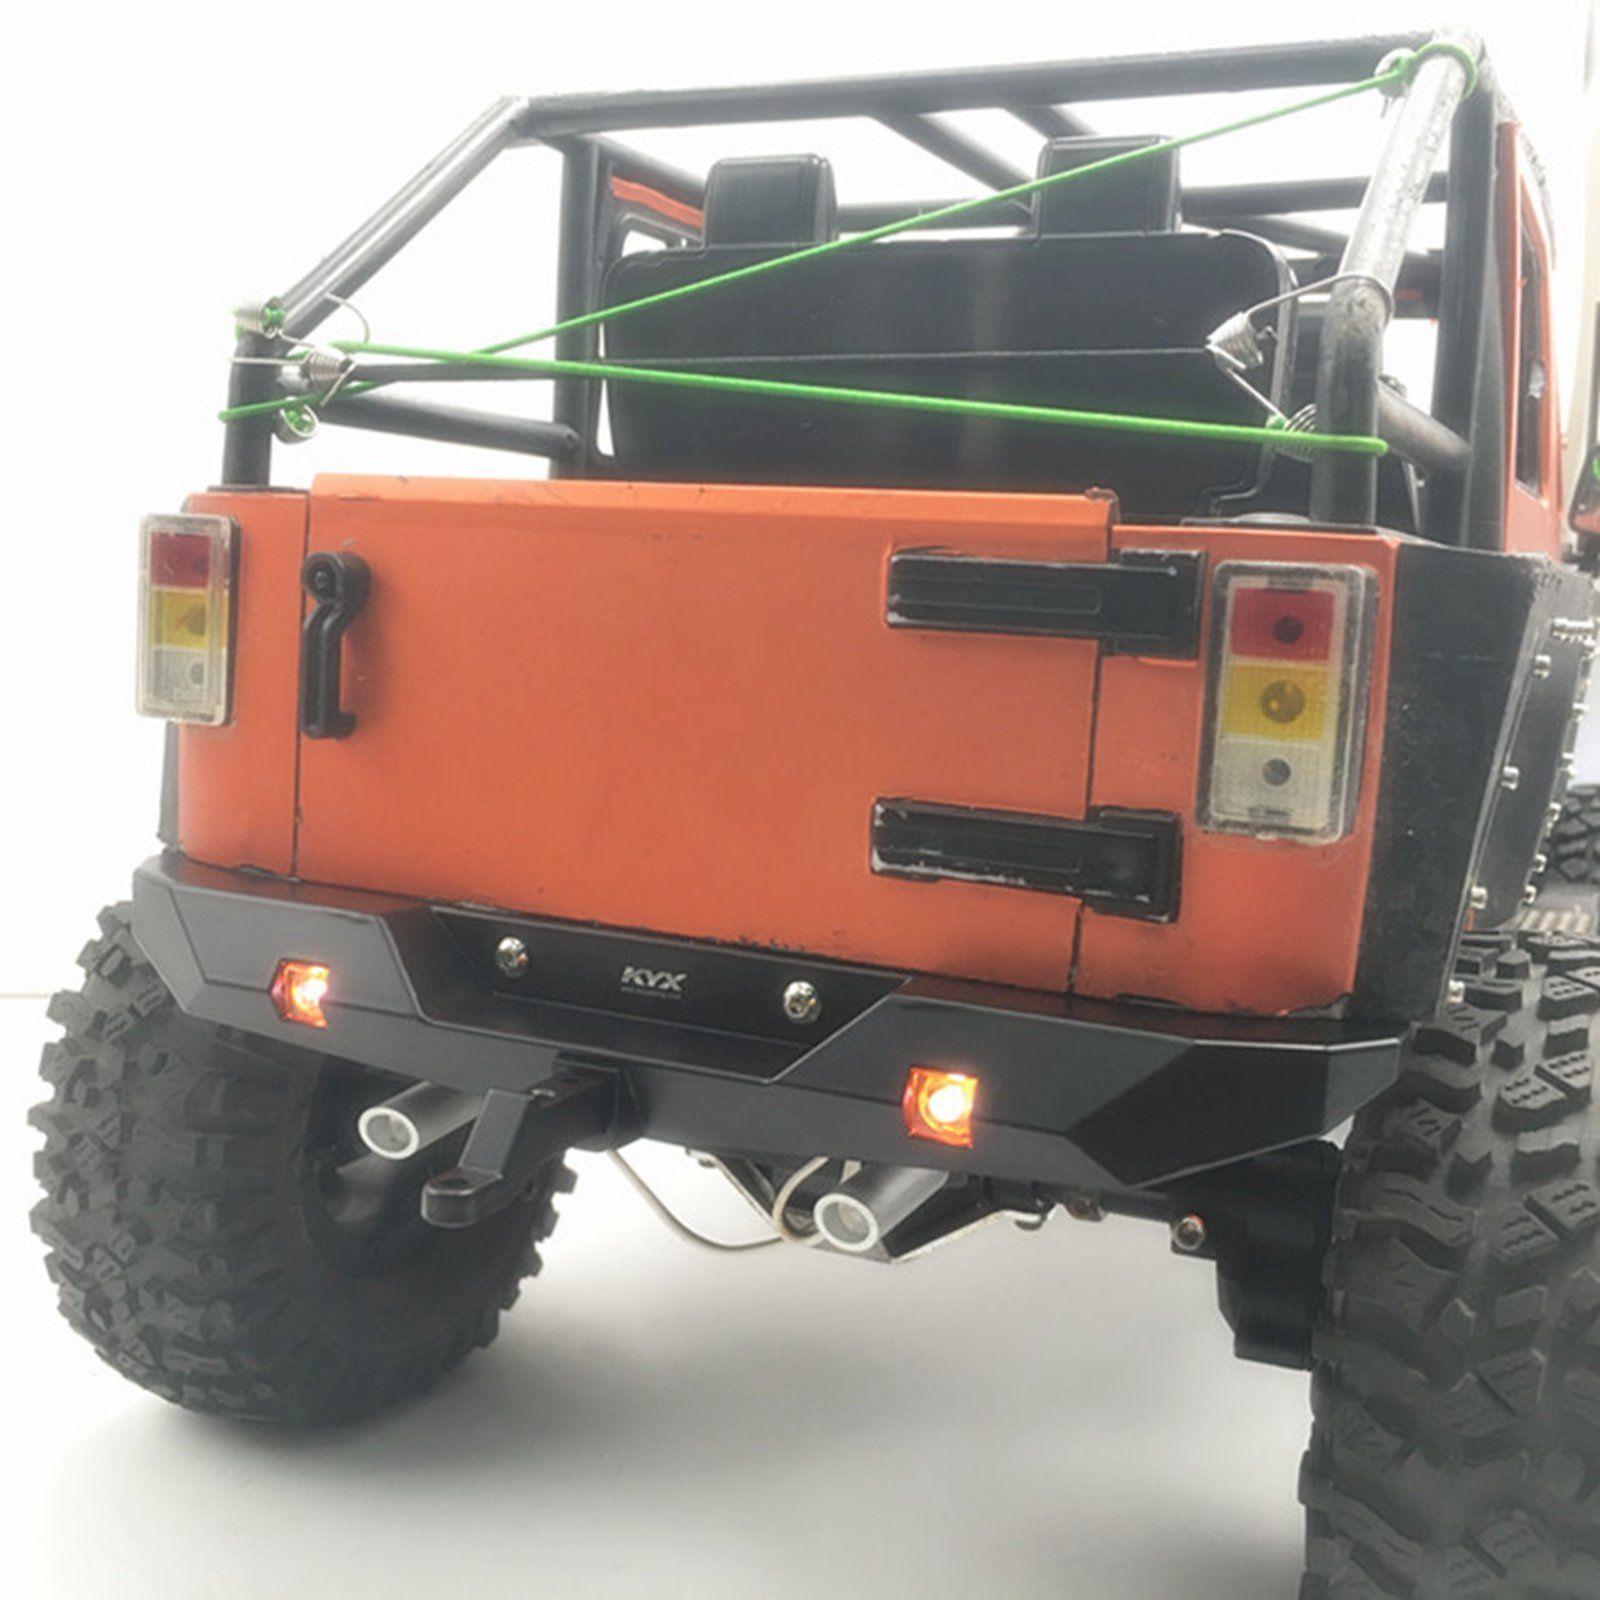 For Traxxas Rock Crawler Trx 4 Axial Scx10 90046 Rc Car Parts Exhaust Pipes Ebay Rc Car Parts Traxxas Car Parts